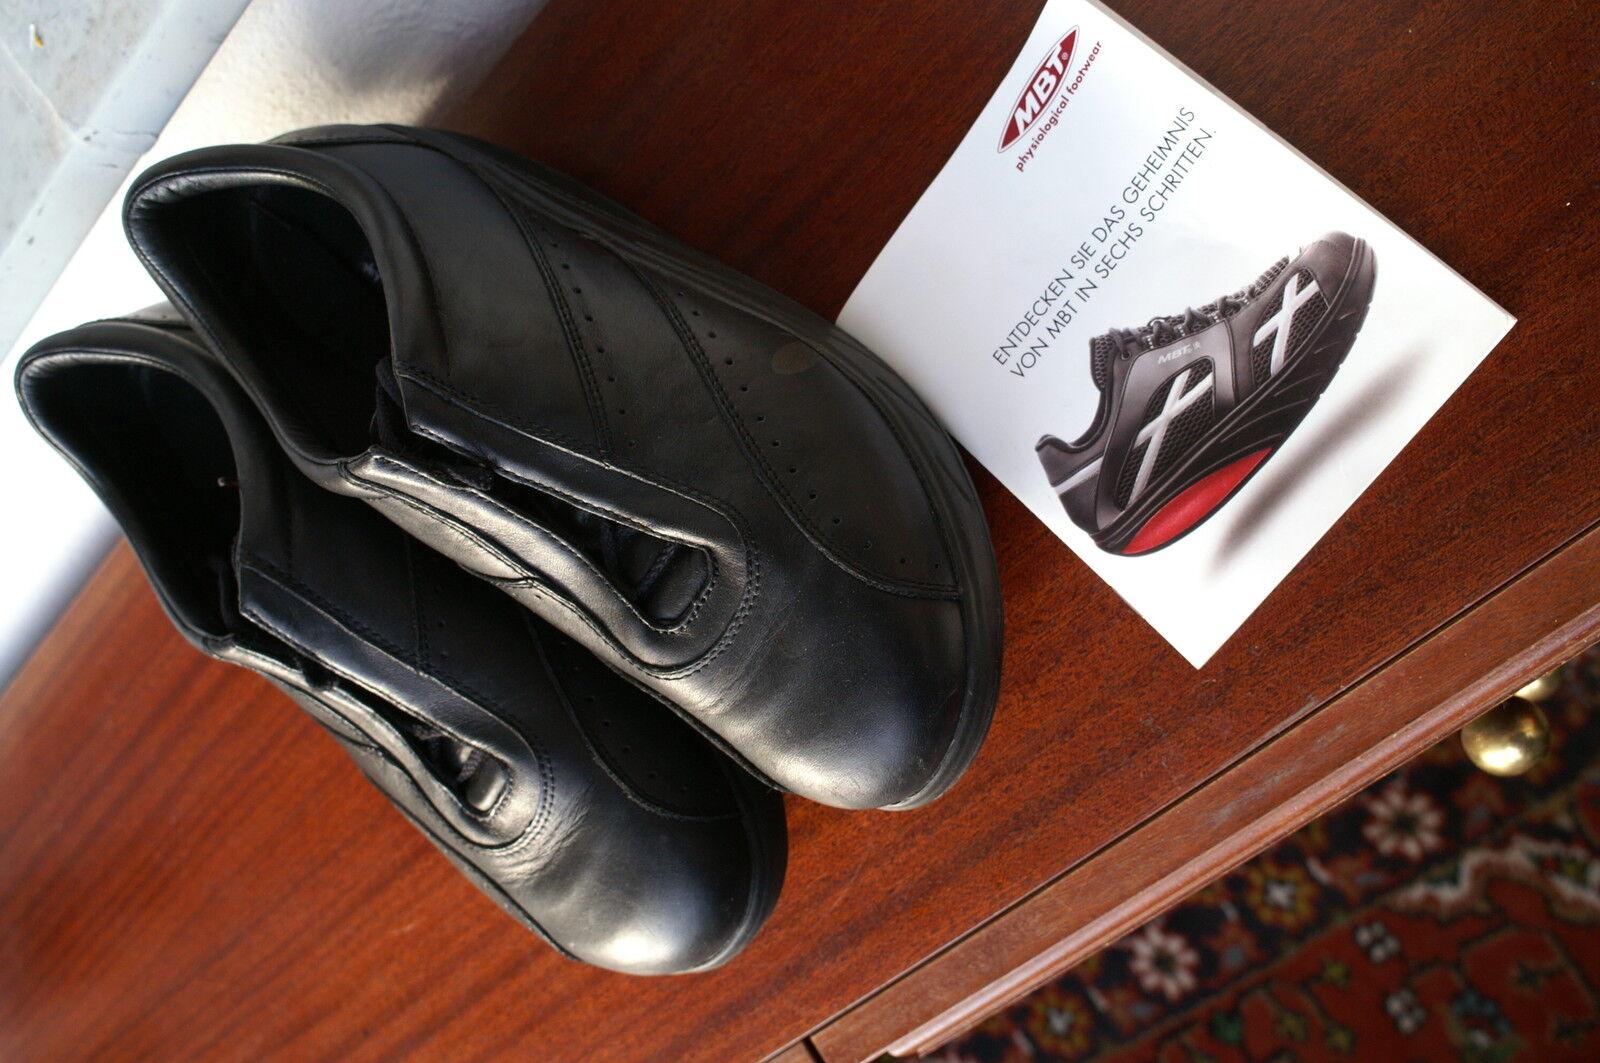 (Herren Schuh Größe 42, MTB, MTB, MTB, sehr gut erhalten fast neuwertig, plus DVD. 57e600